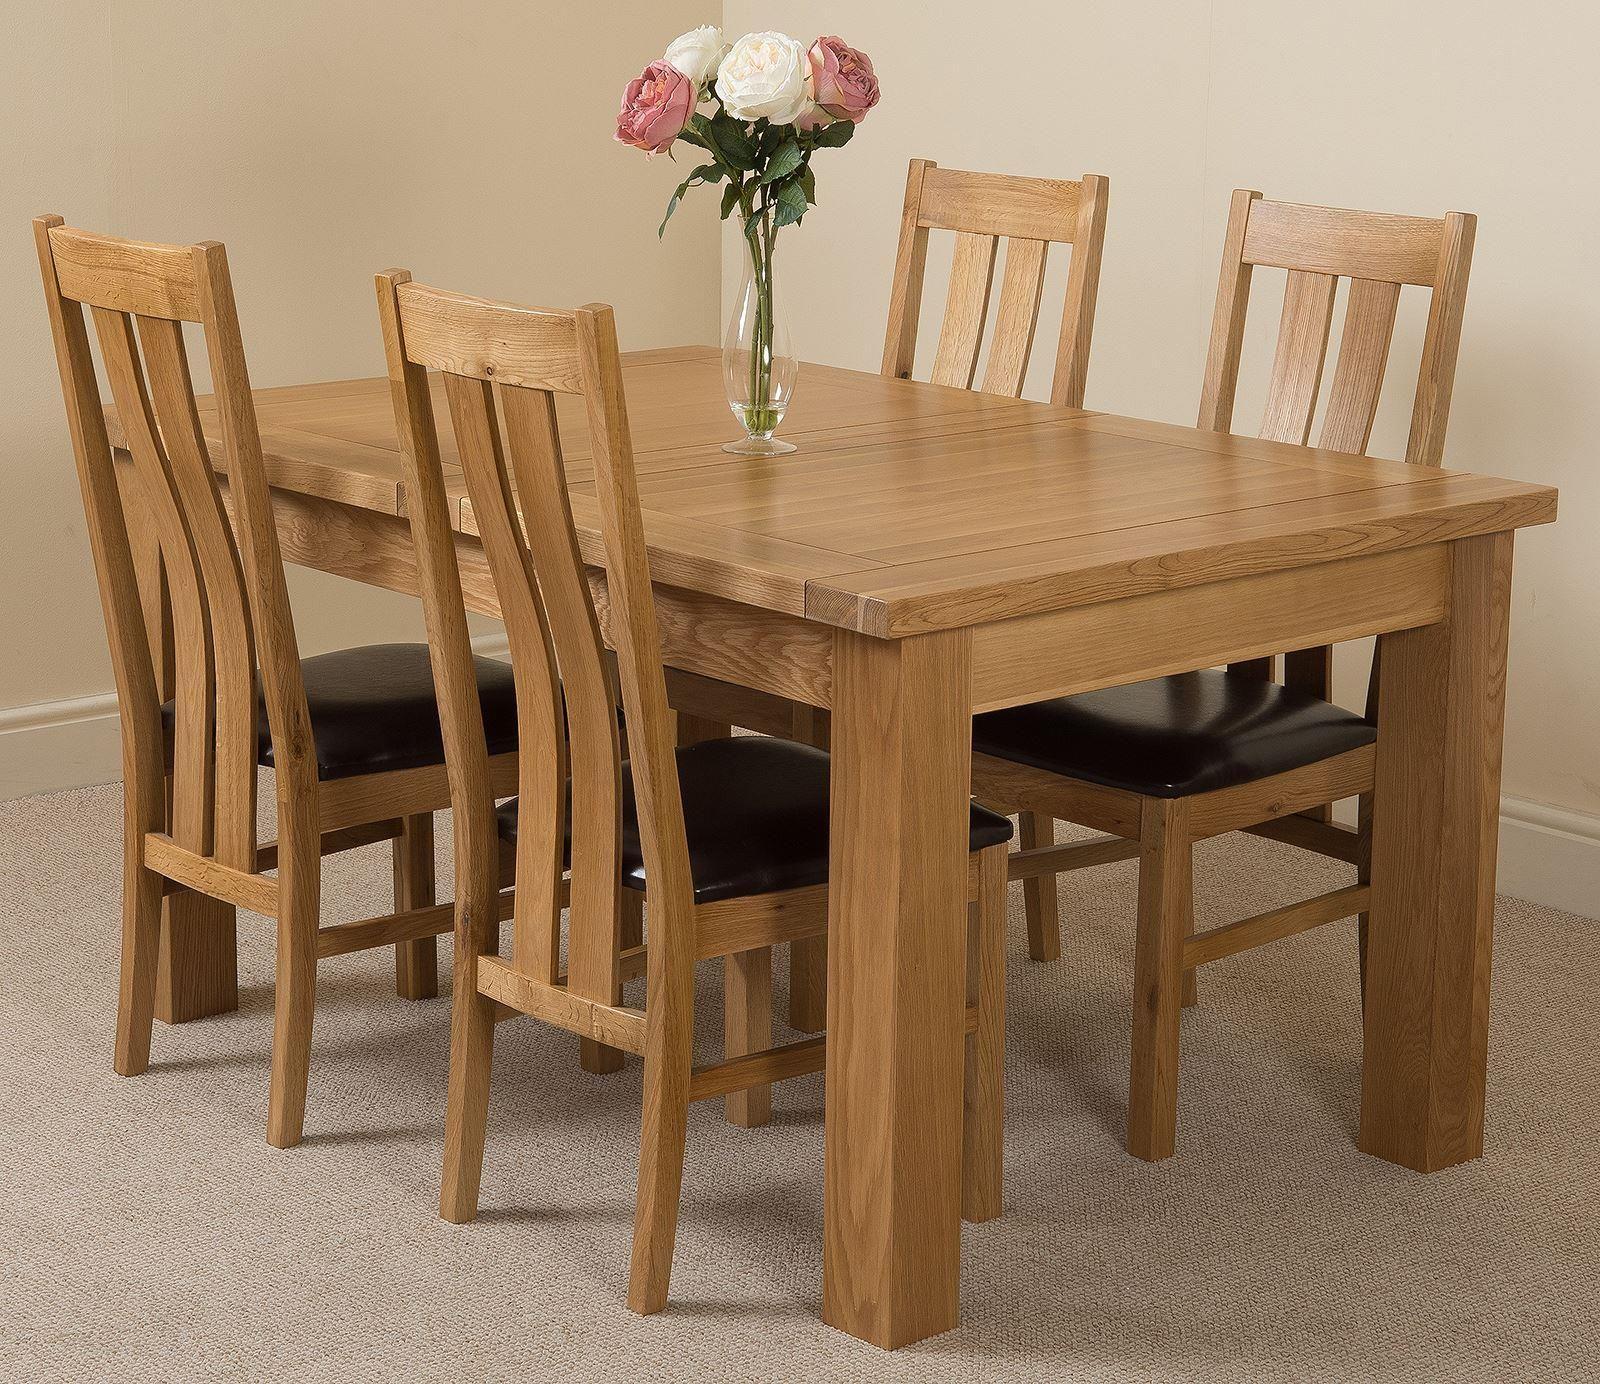 40+ Small oak dining table Best Seller